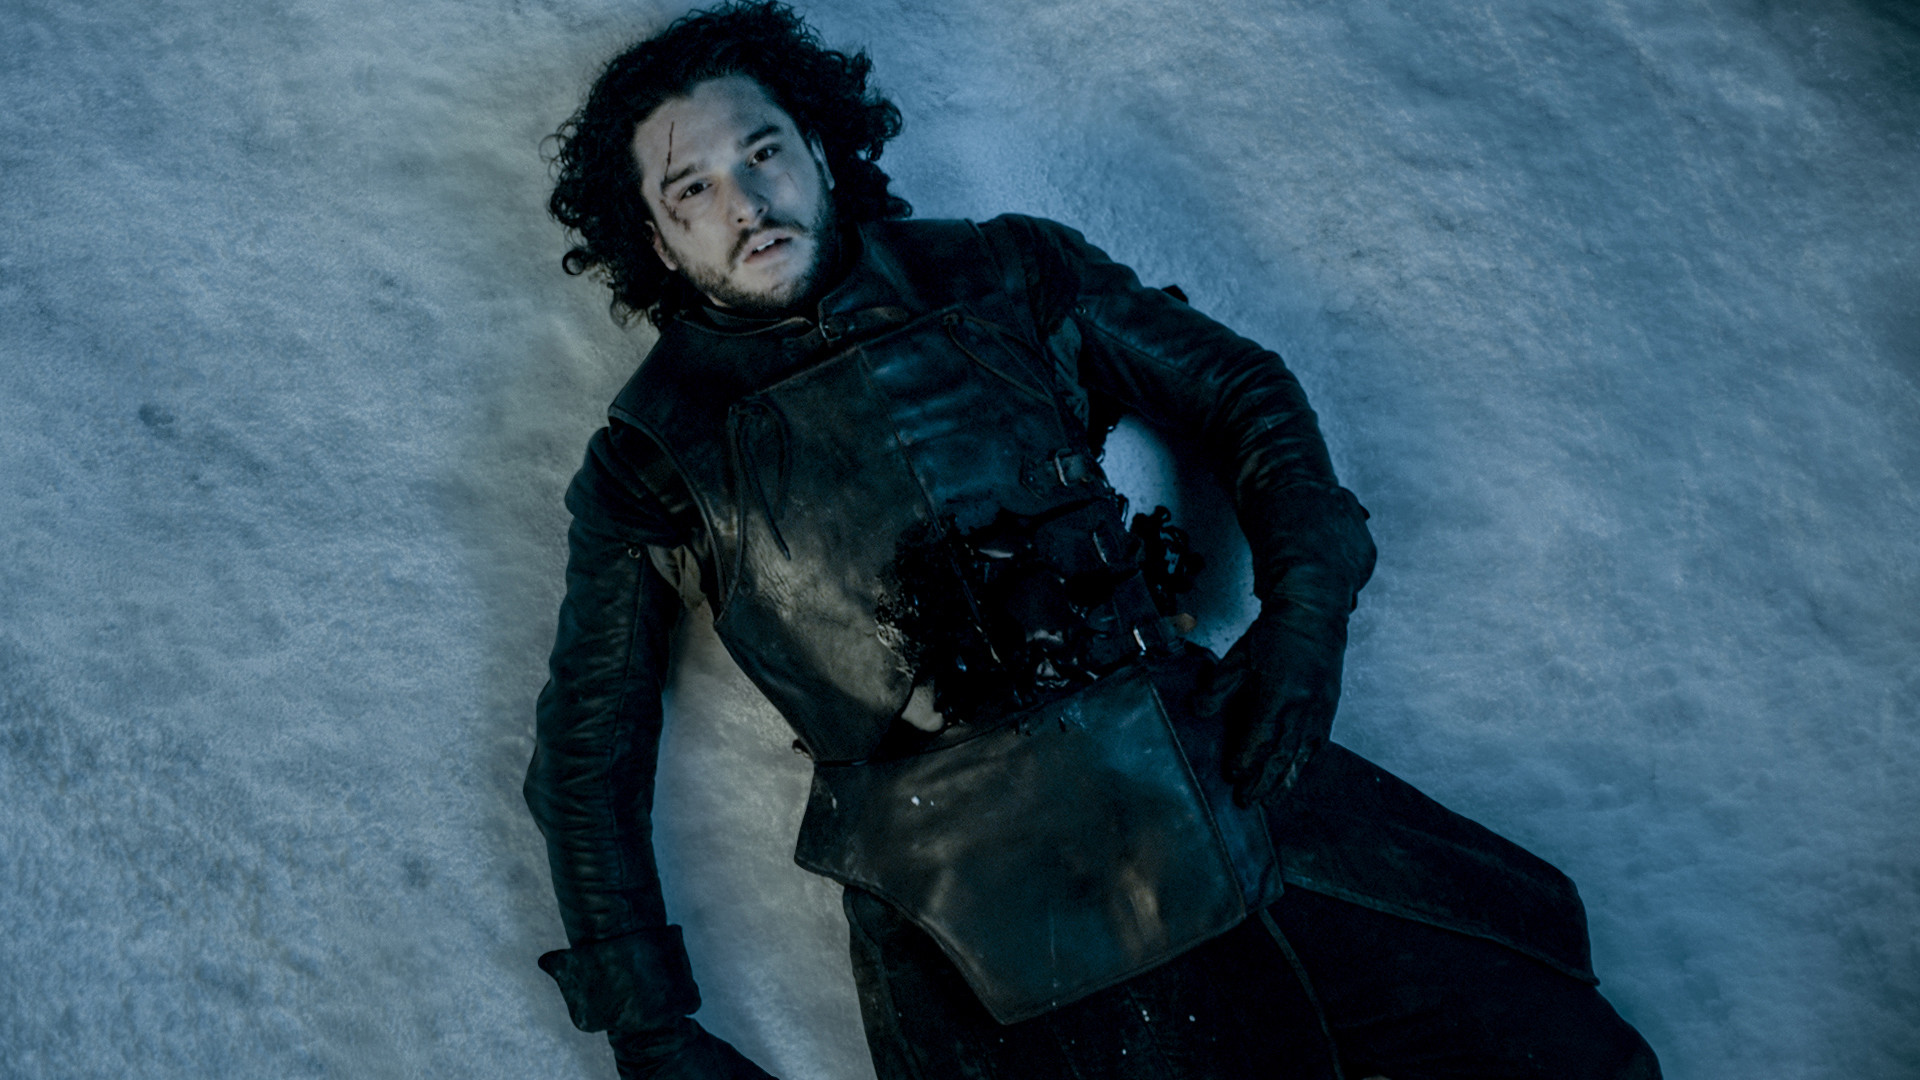 Fil:Jon's death.jpg